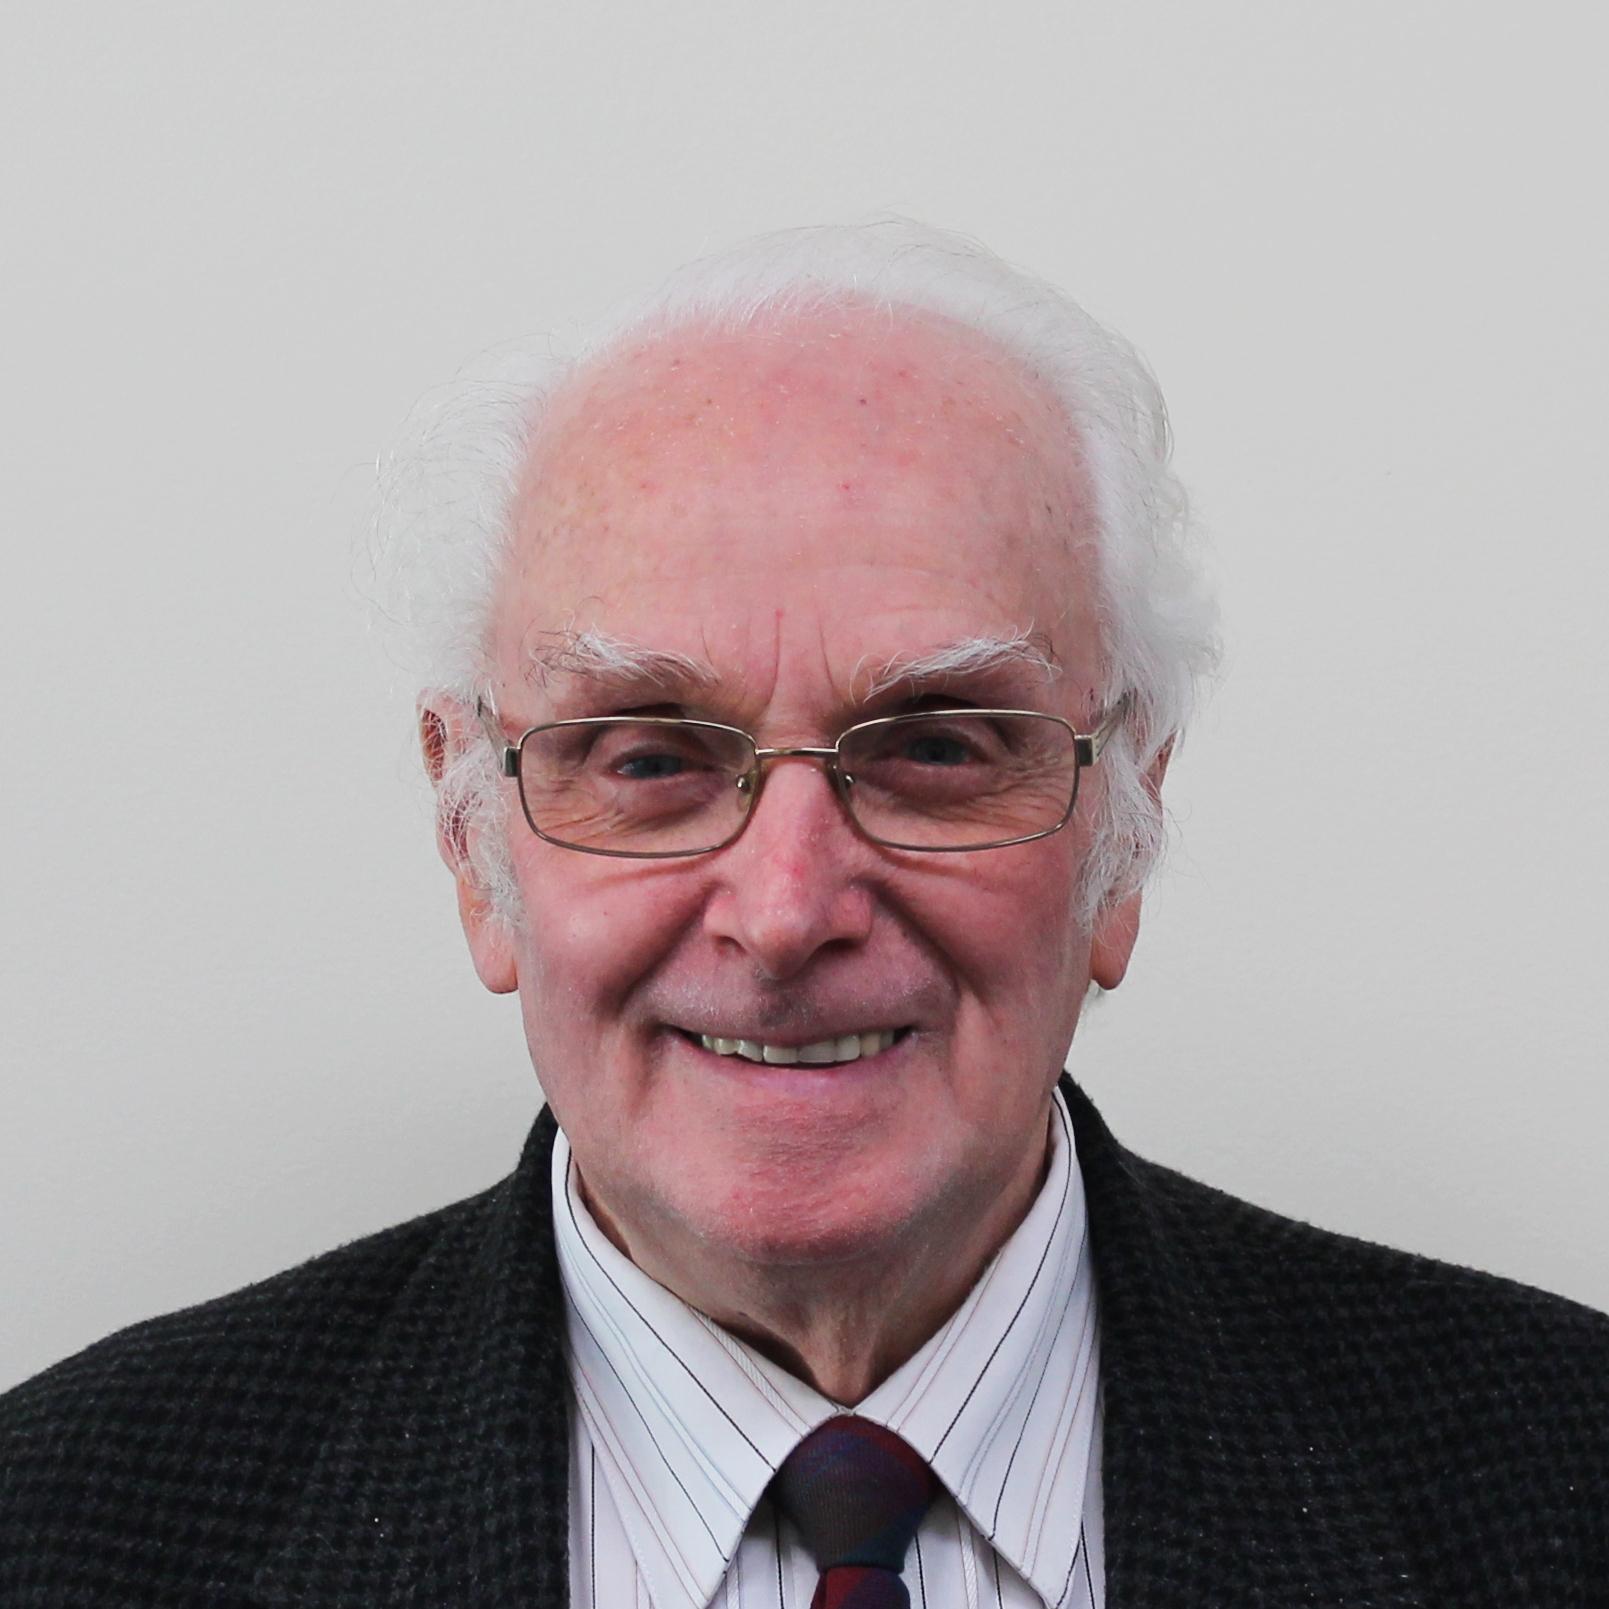 murray adamthwaite adjunct lecturer old testament bible.jpg